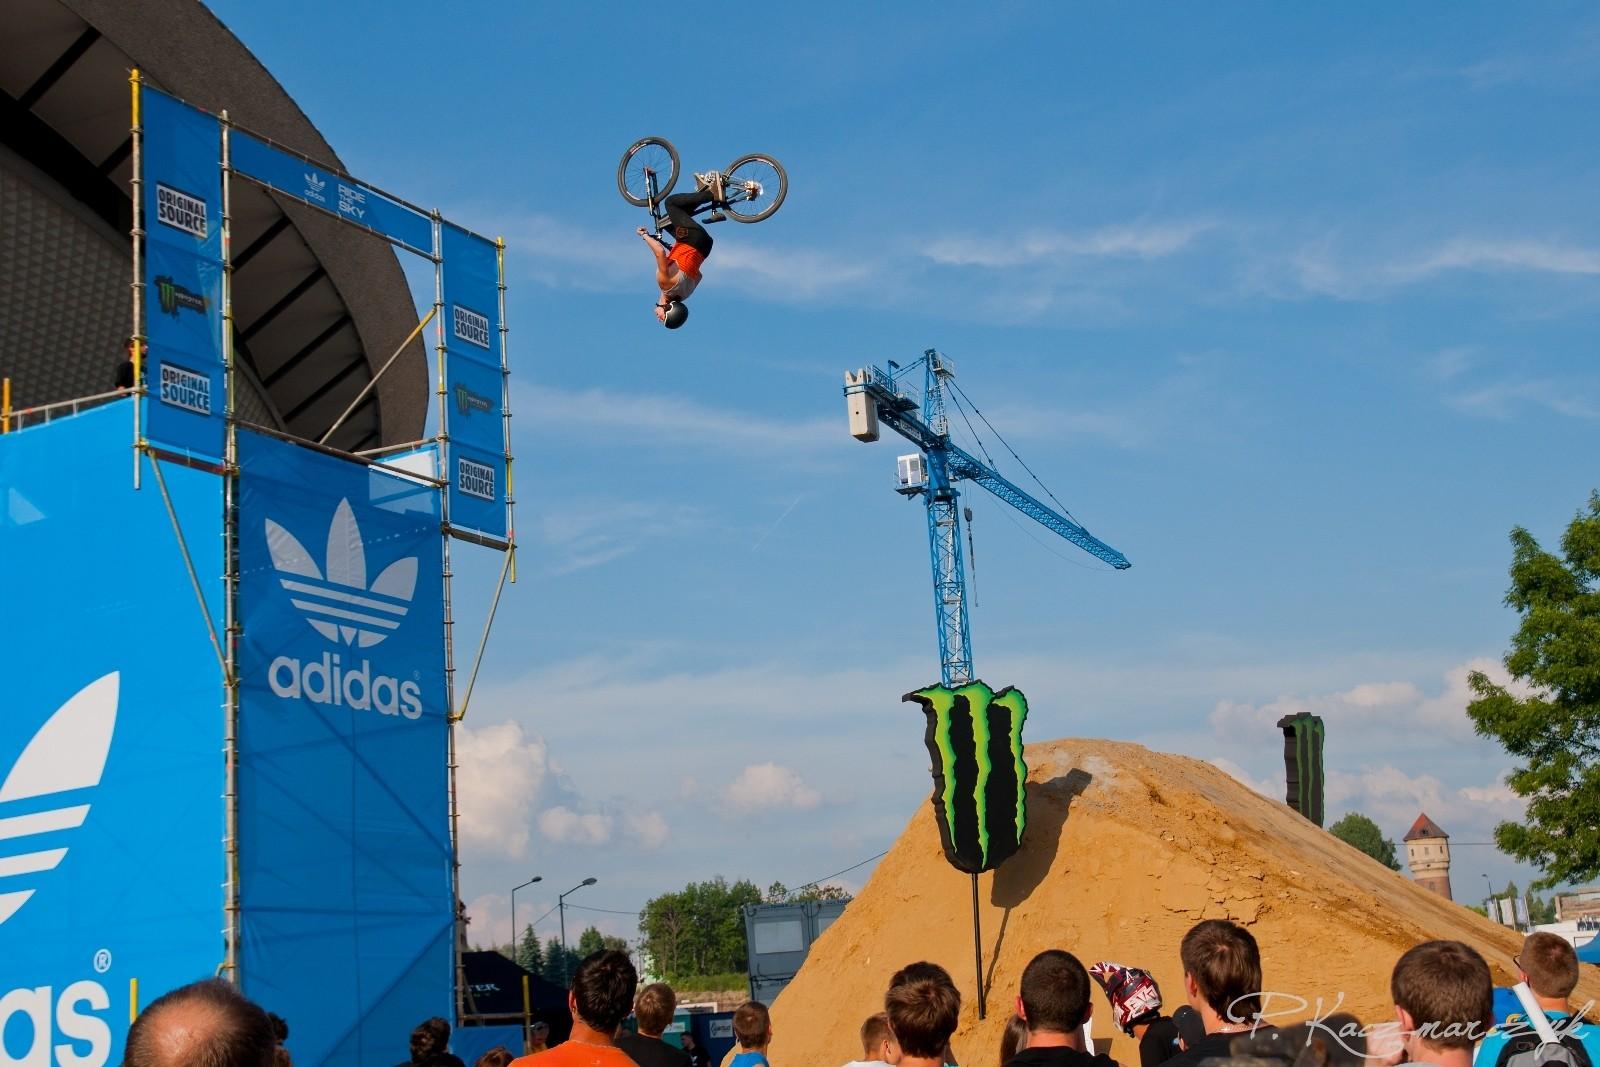 Backflip step down - piotrkaczmarczyk - Mountain Biking Pictures - Vital MTB